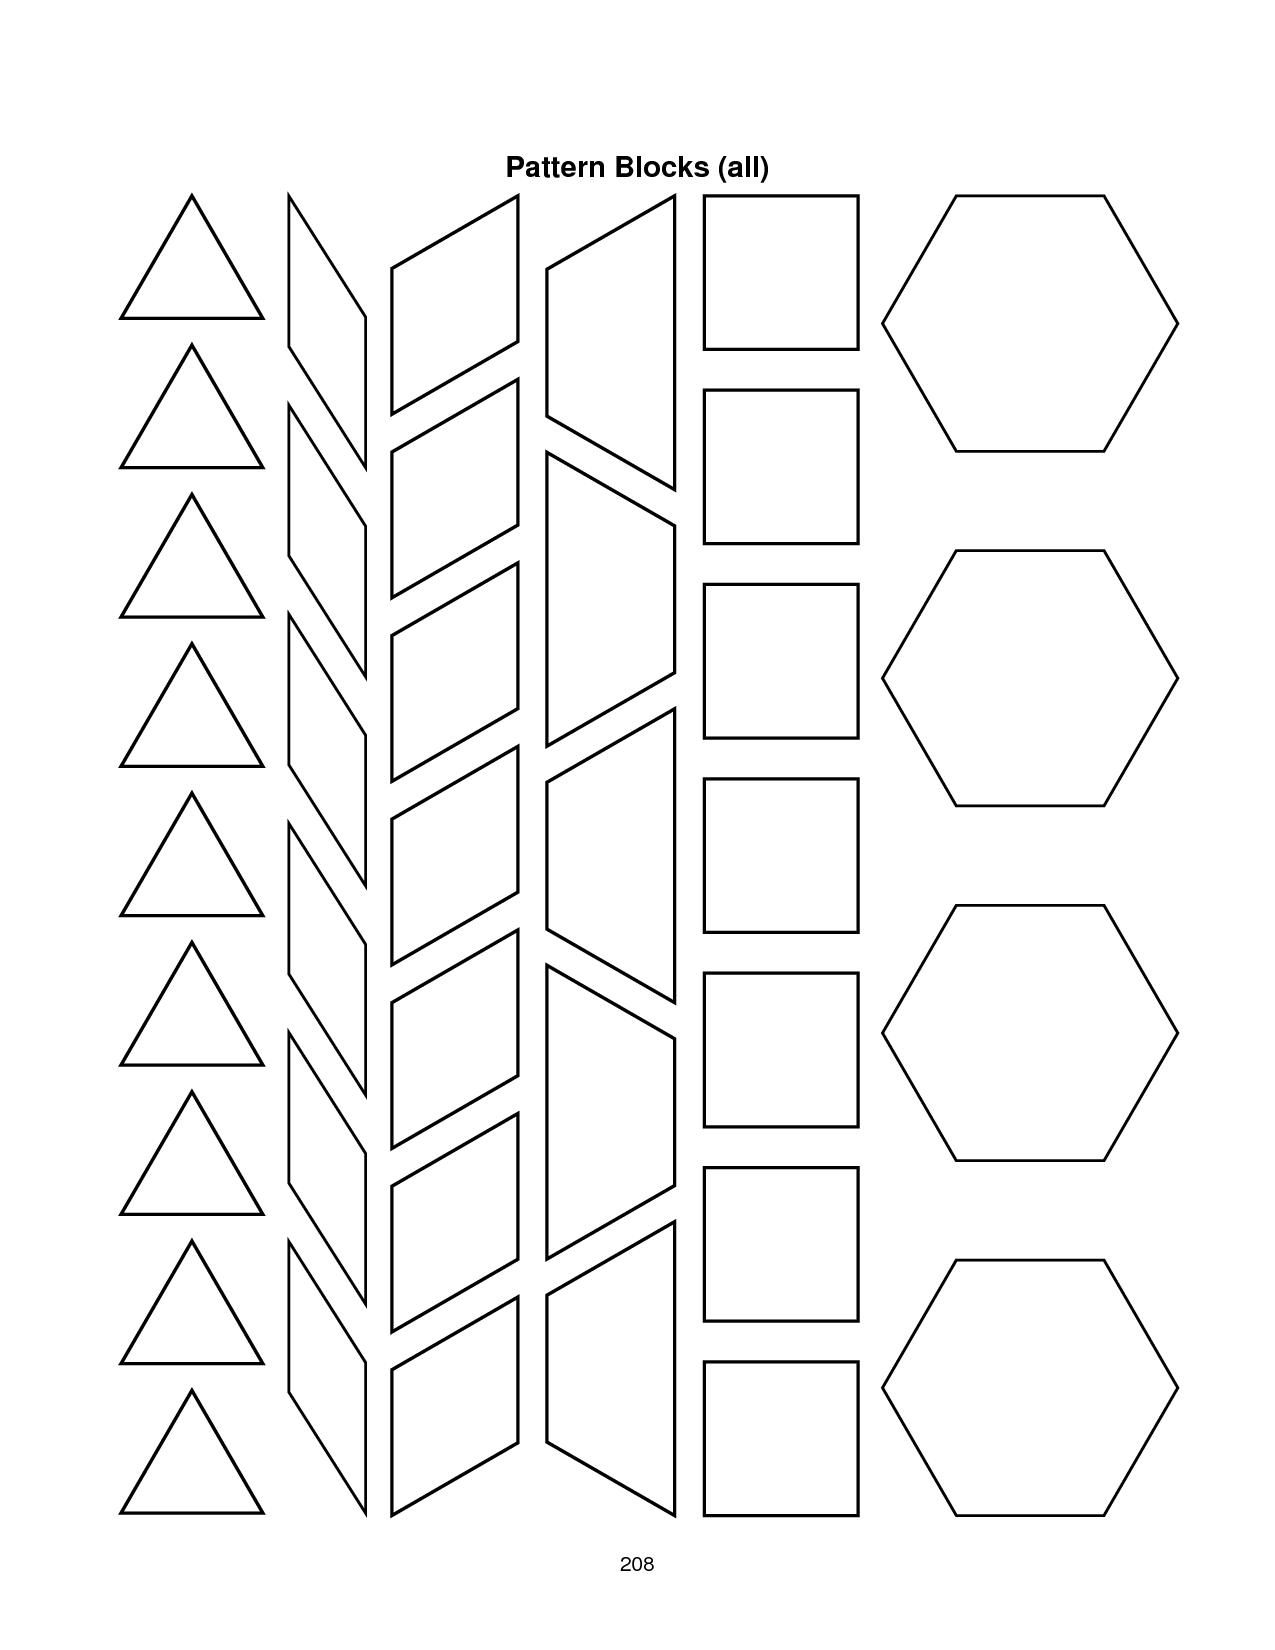 28 Images Of Blank Alphabet Pattern Block Template   Migapps Pertaining To Blank Pattern Block Templates